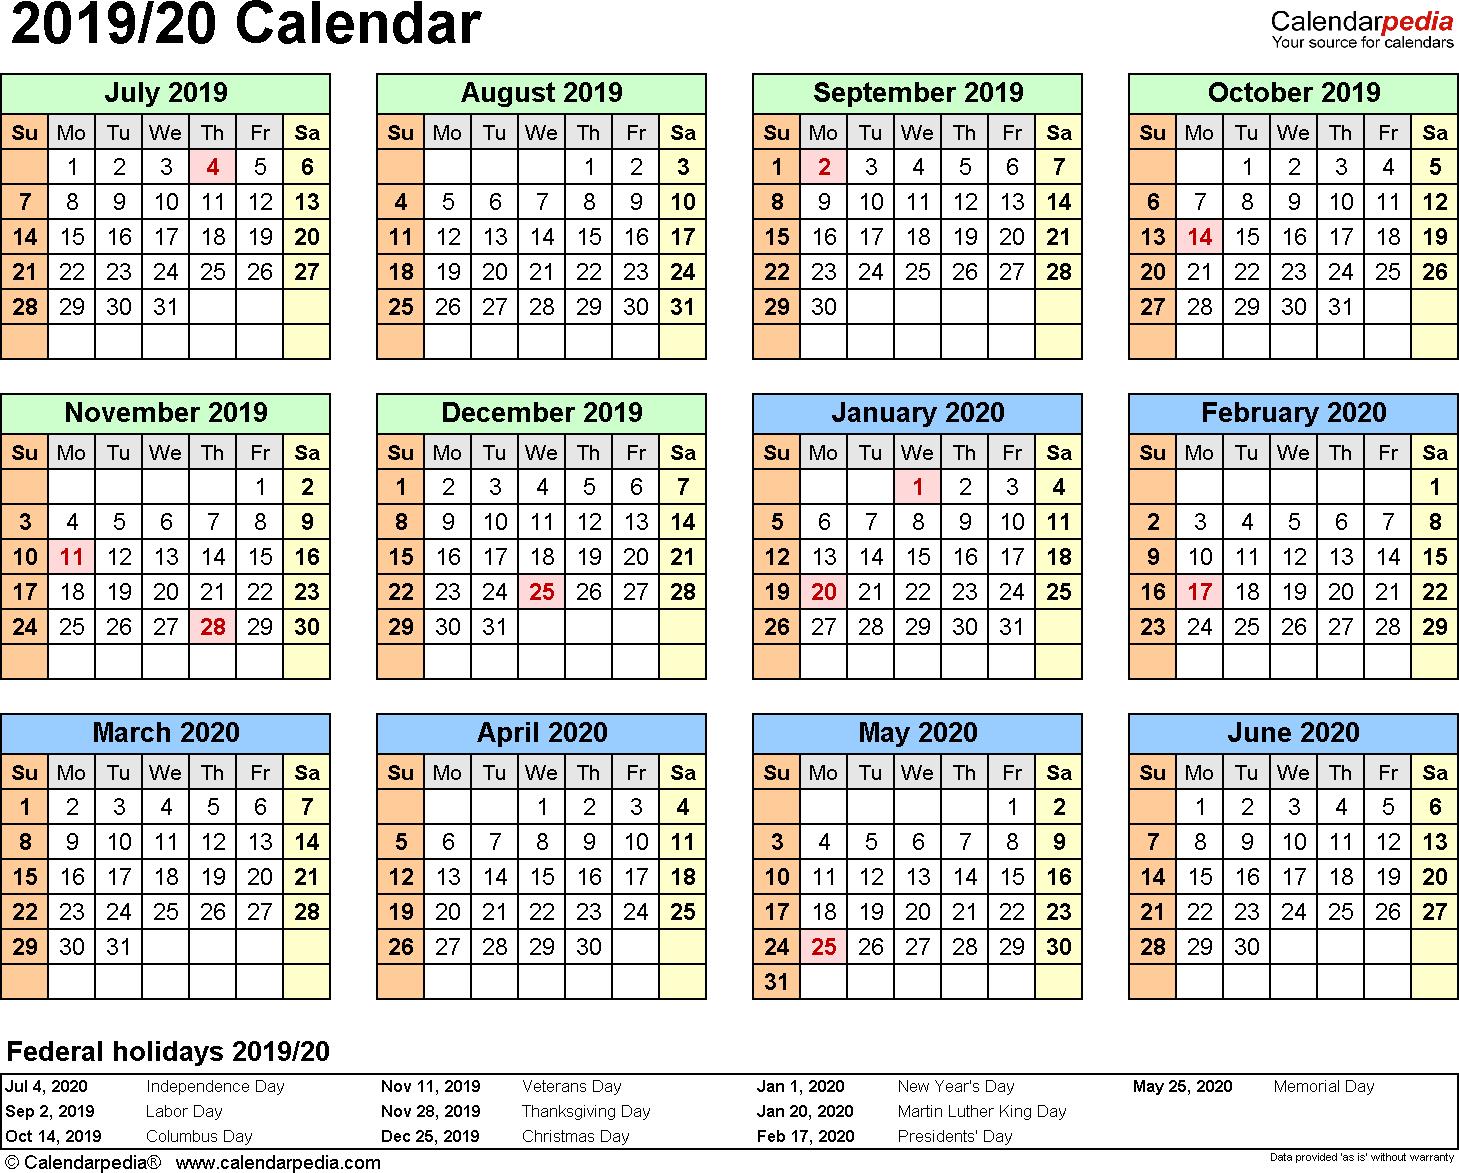 Split Year Calendar 2019/20 (July To June) - Word Templates inside 2019 2020 Ms Word Calendar